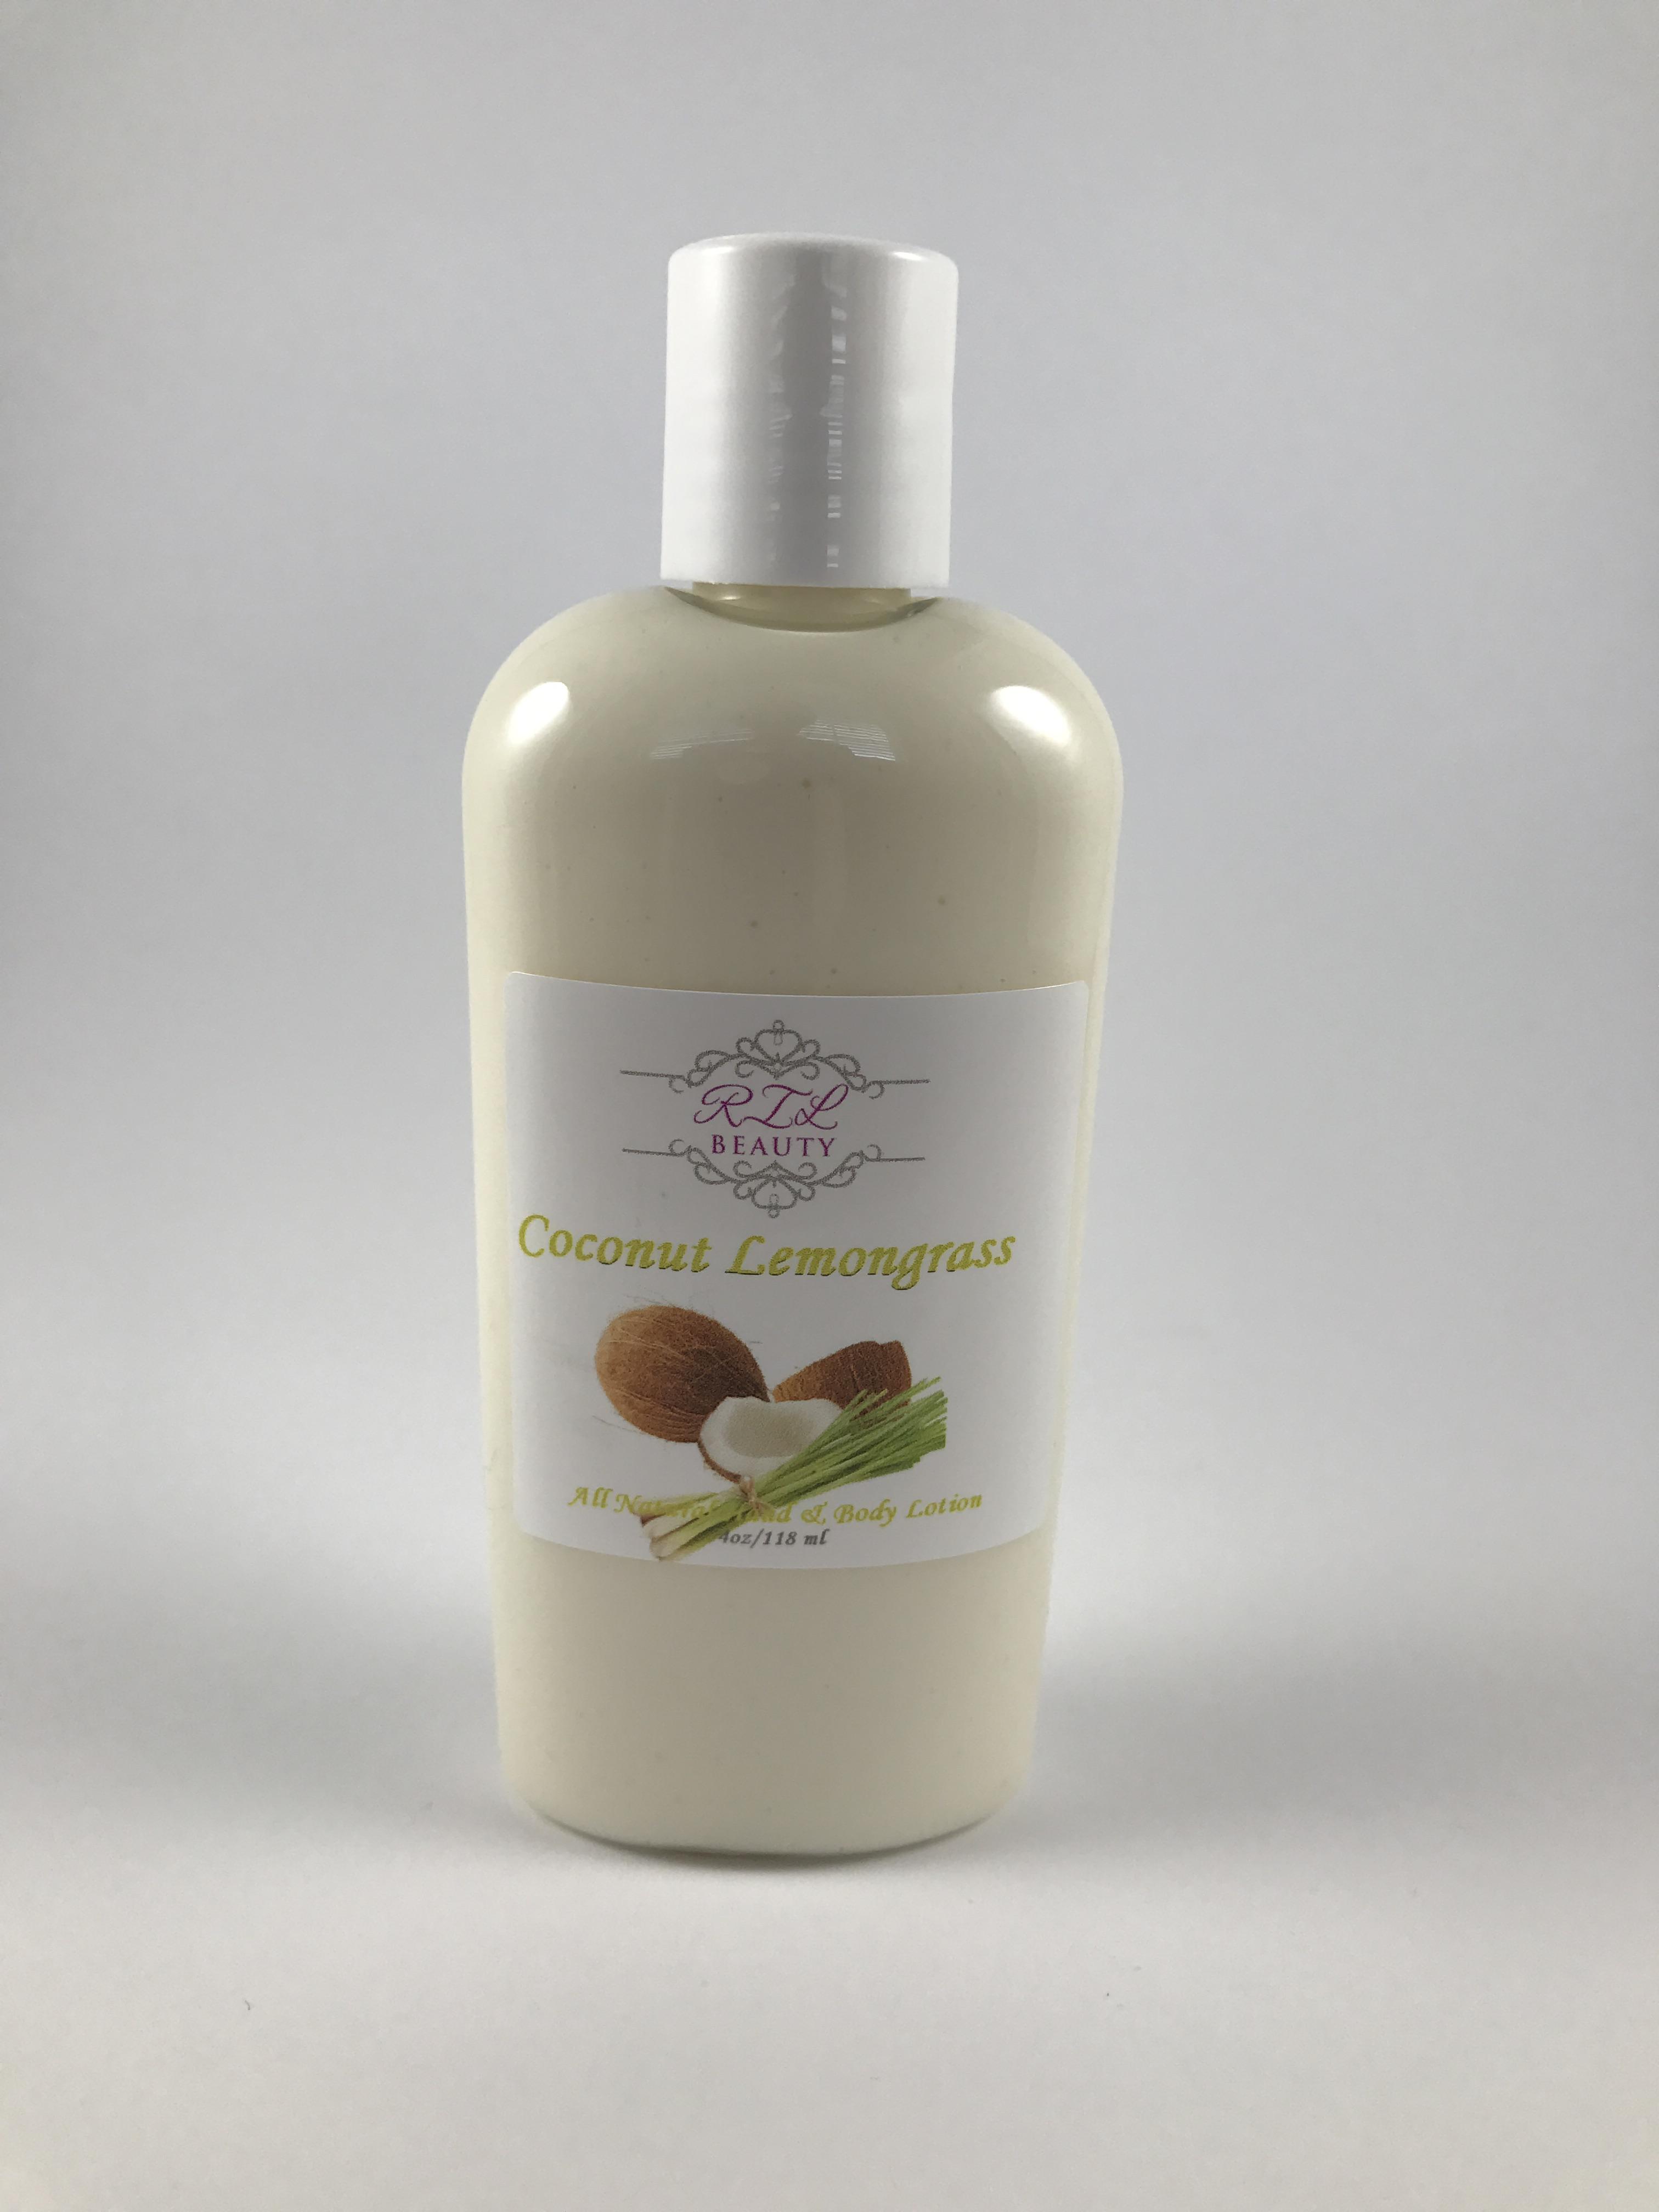 Coconut Lemongrass 2 oz. Lotion (Travel Size)